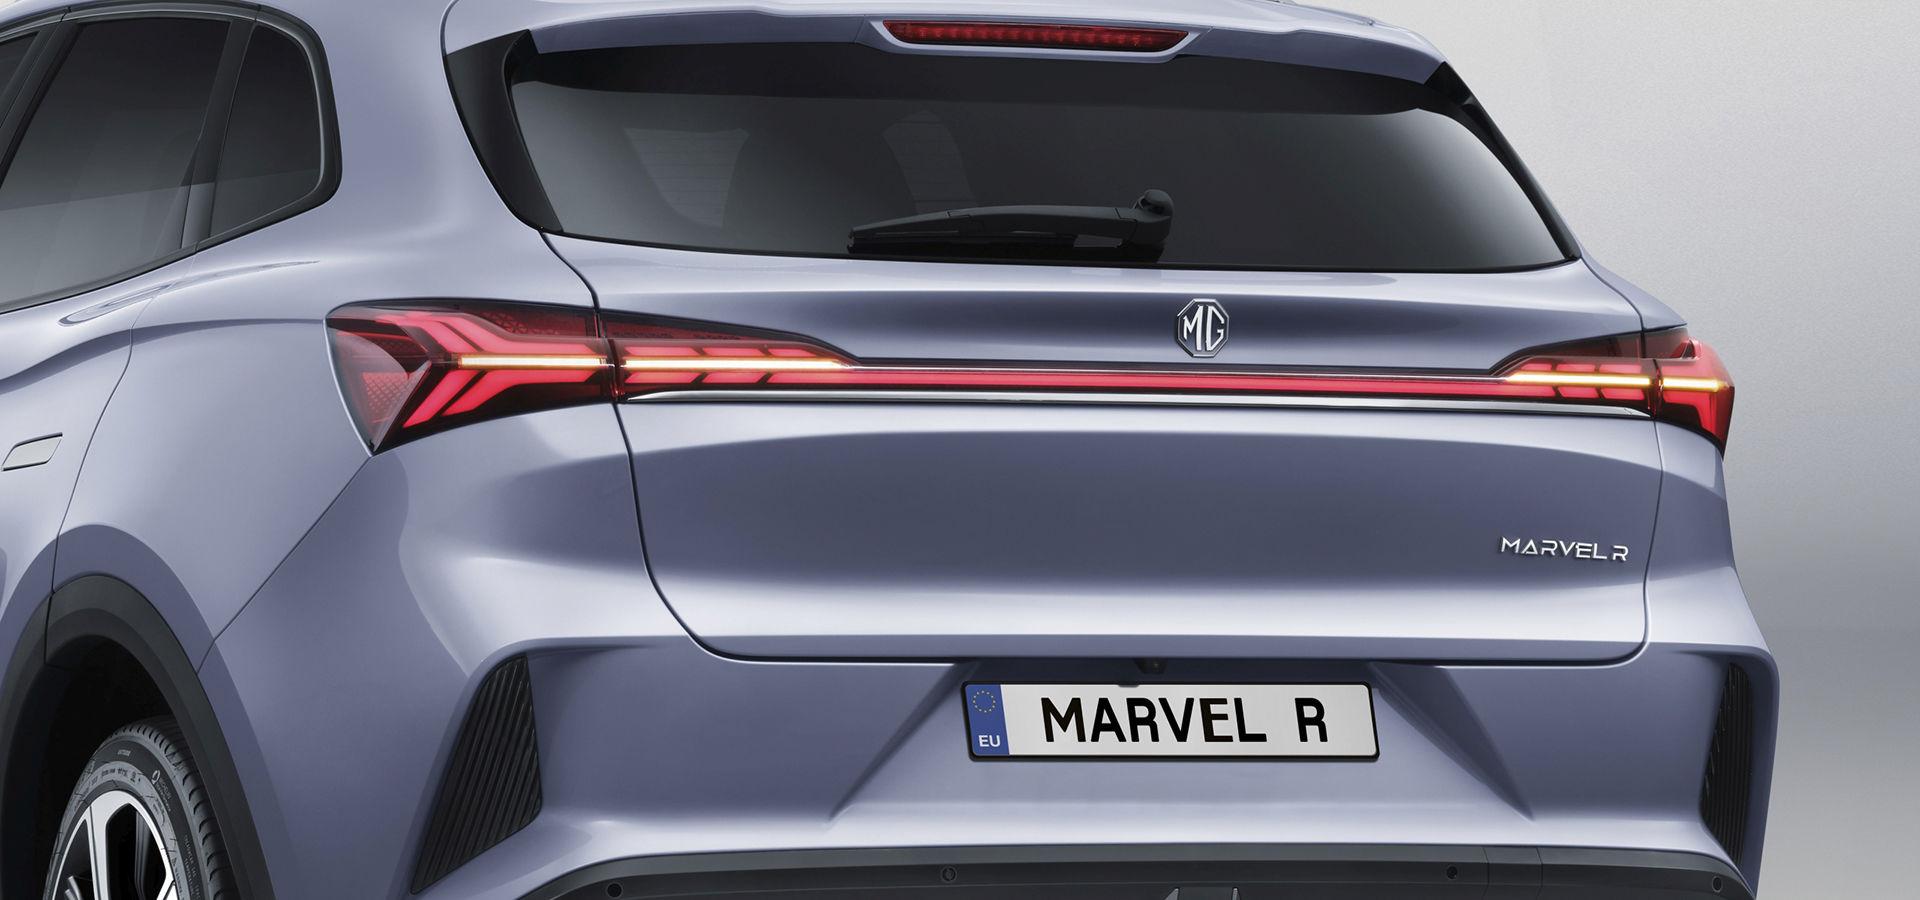 MG Marvel R - фото